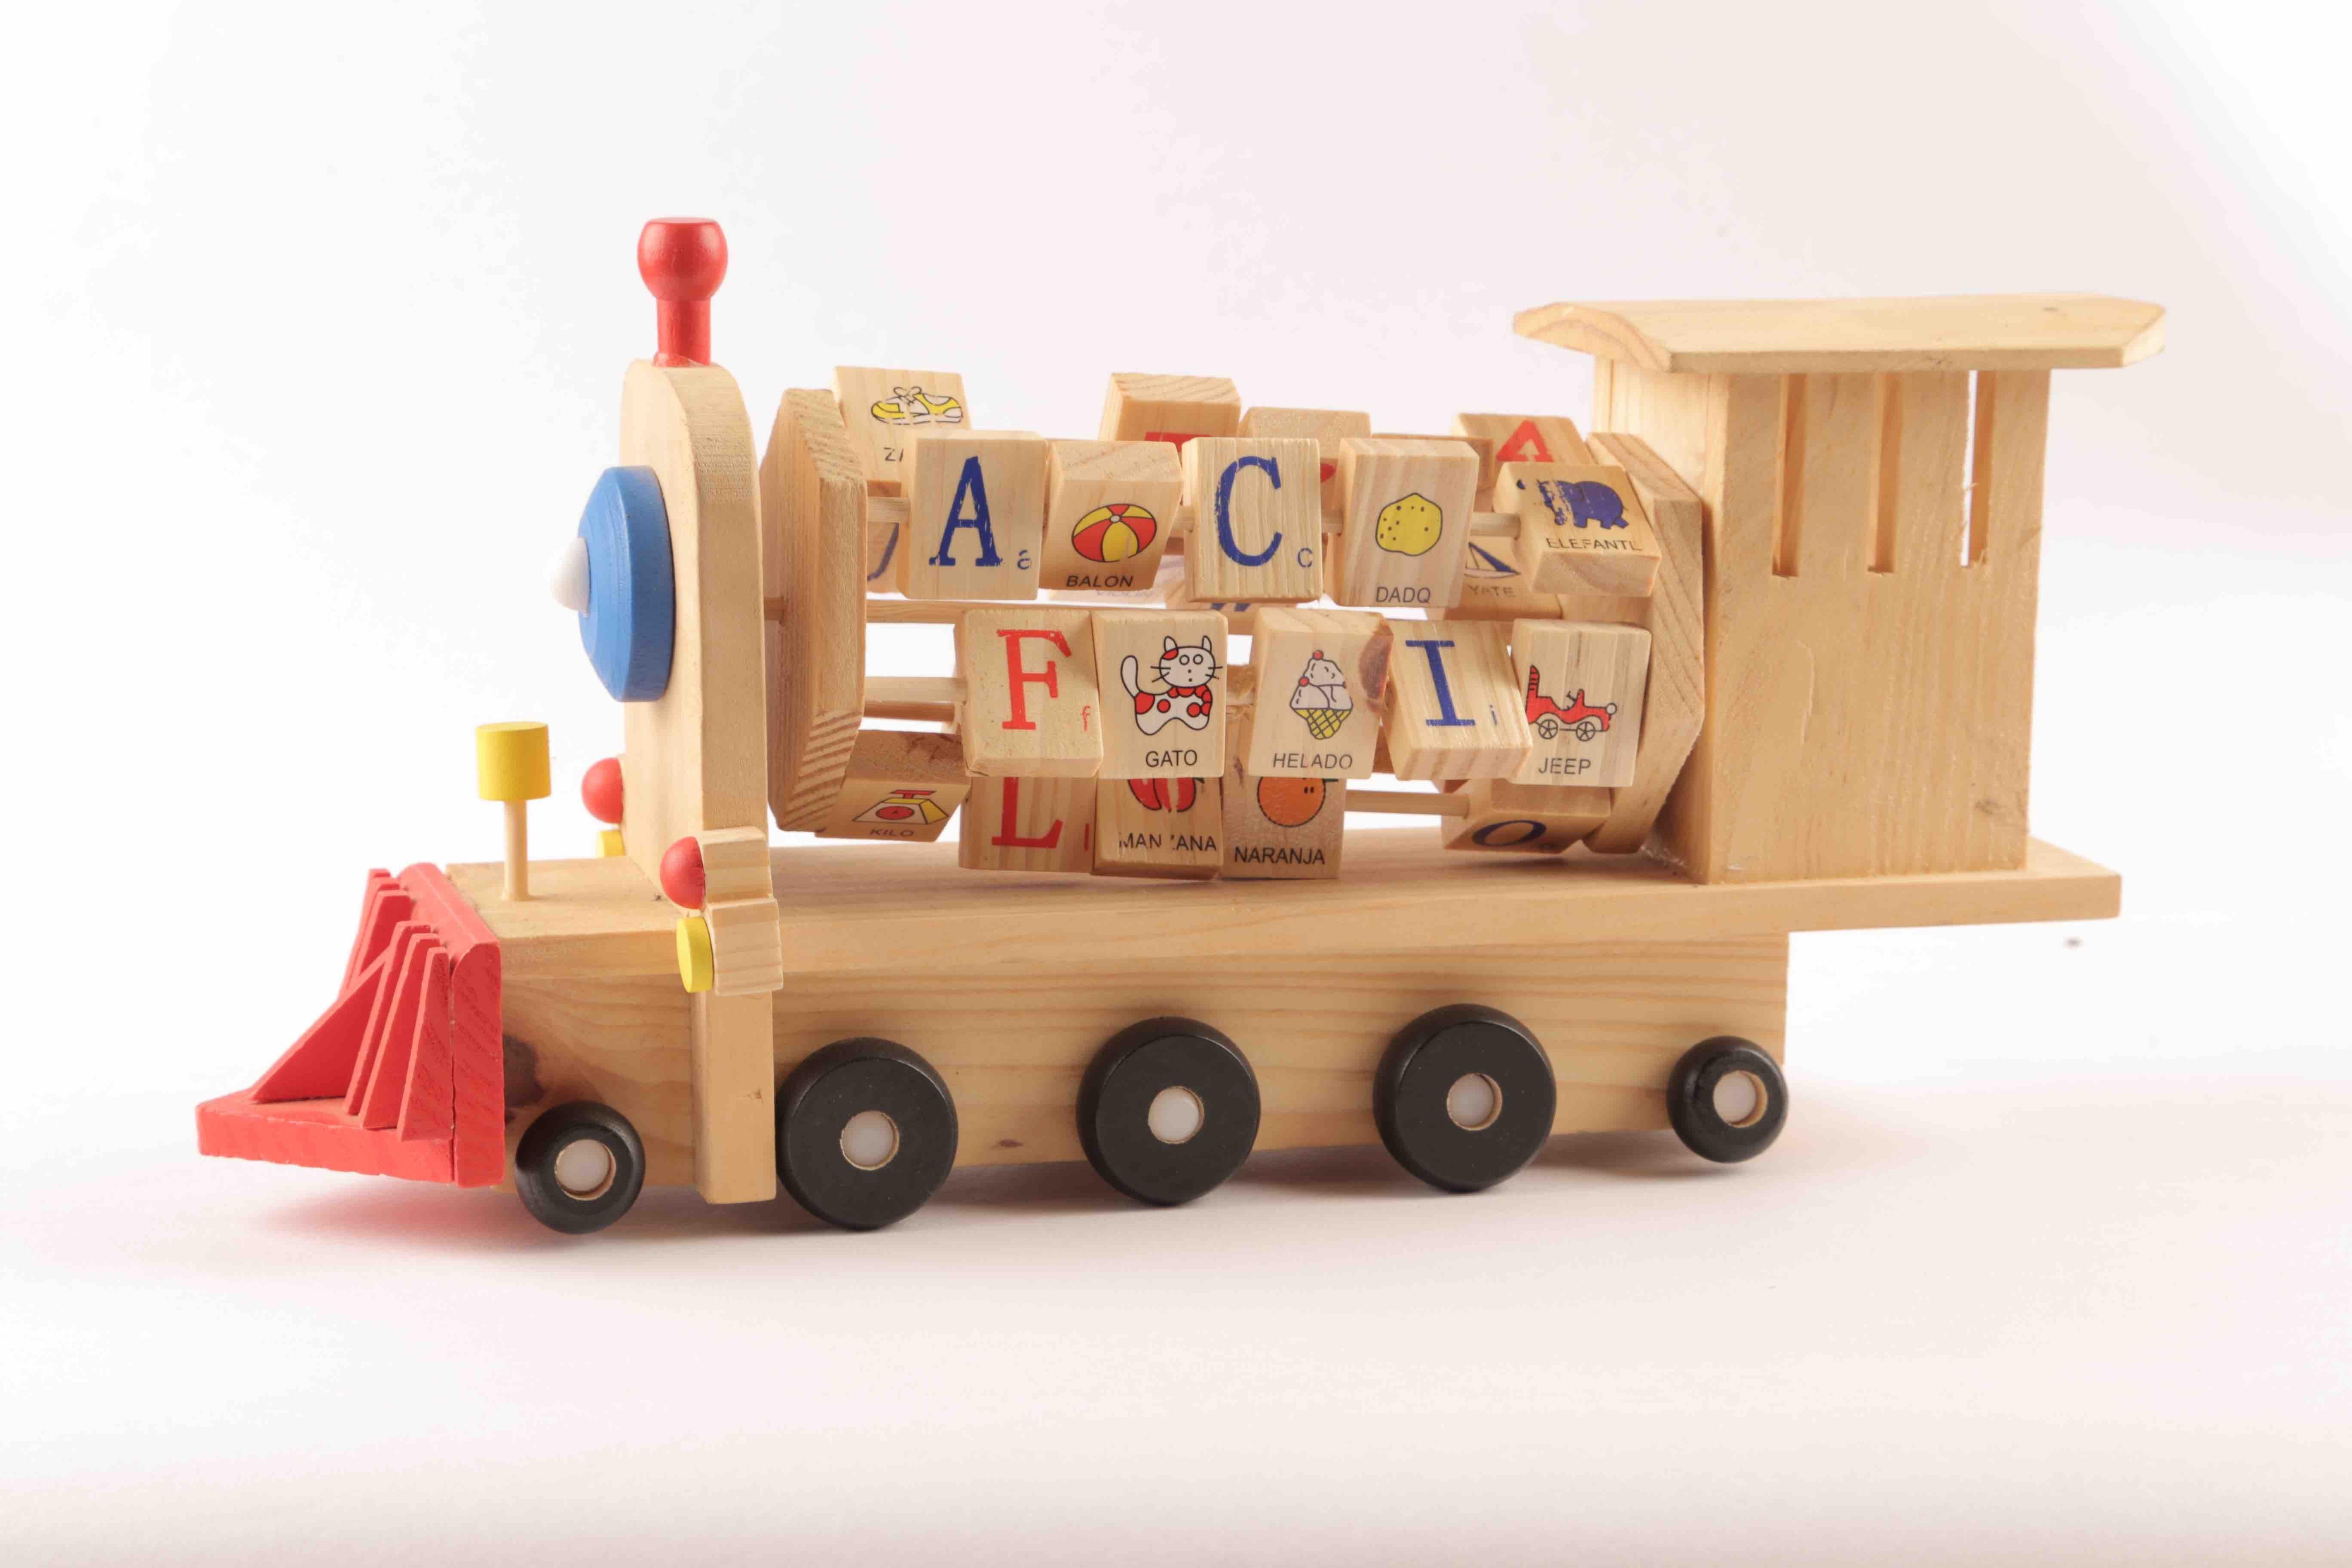 Fotos gratis jugar tren veh culo mueble juguete for Mueble juguetes